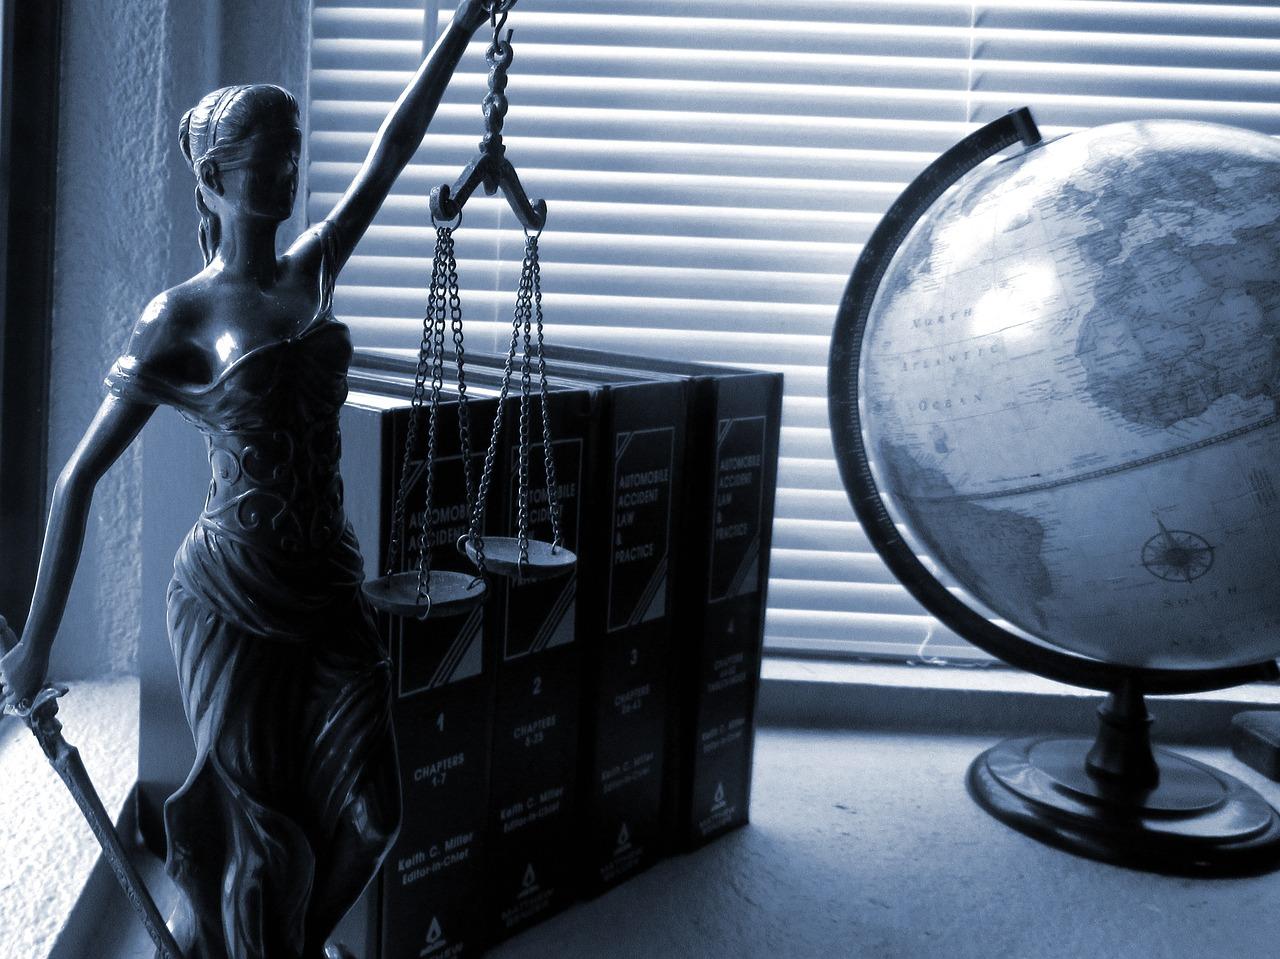 TOP Anwaltskanzlei | Rechtsanwaltsfachangestellte/r | Frankfurt